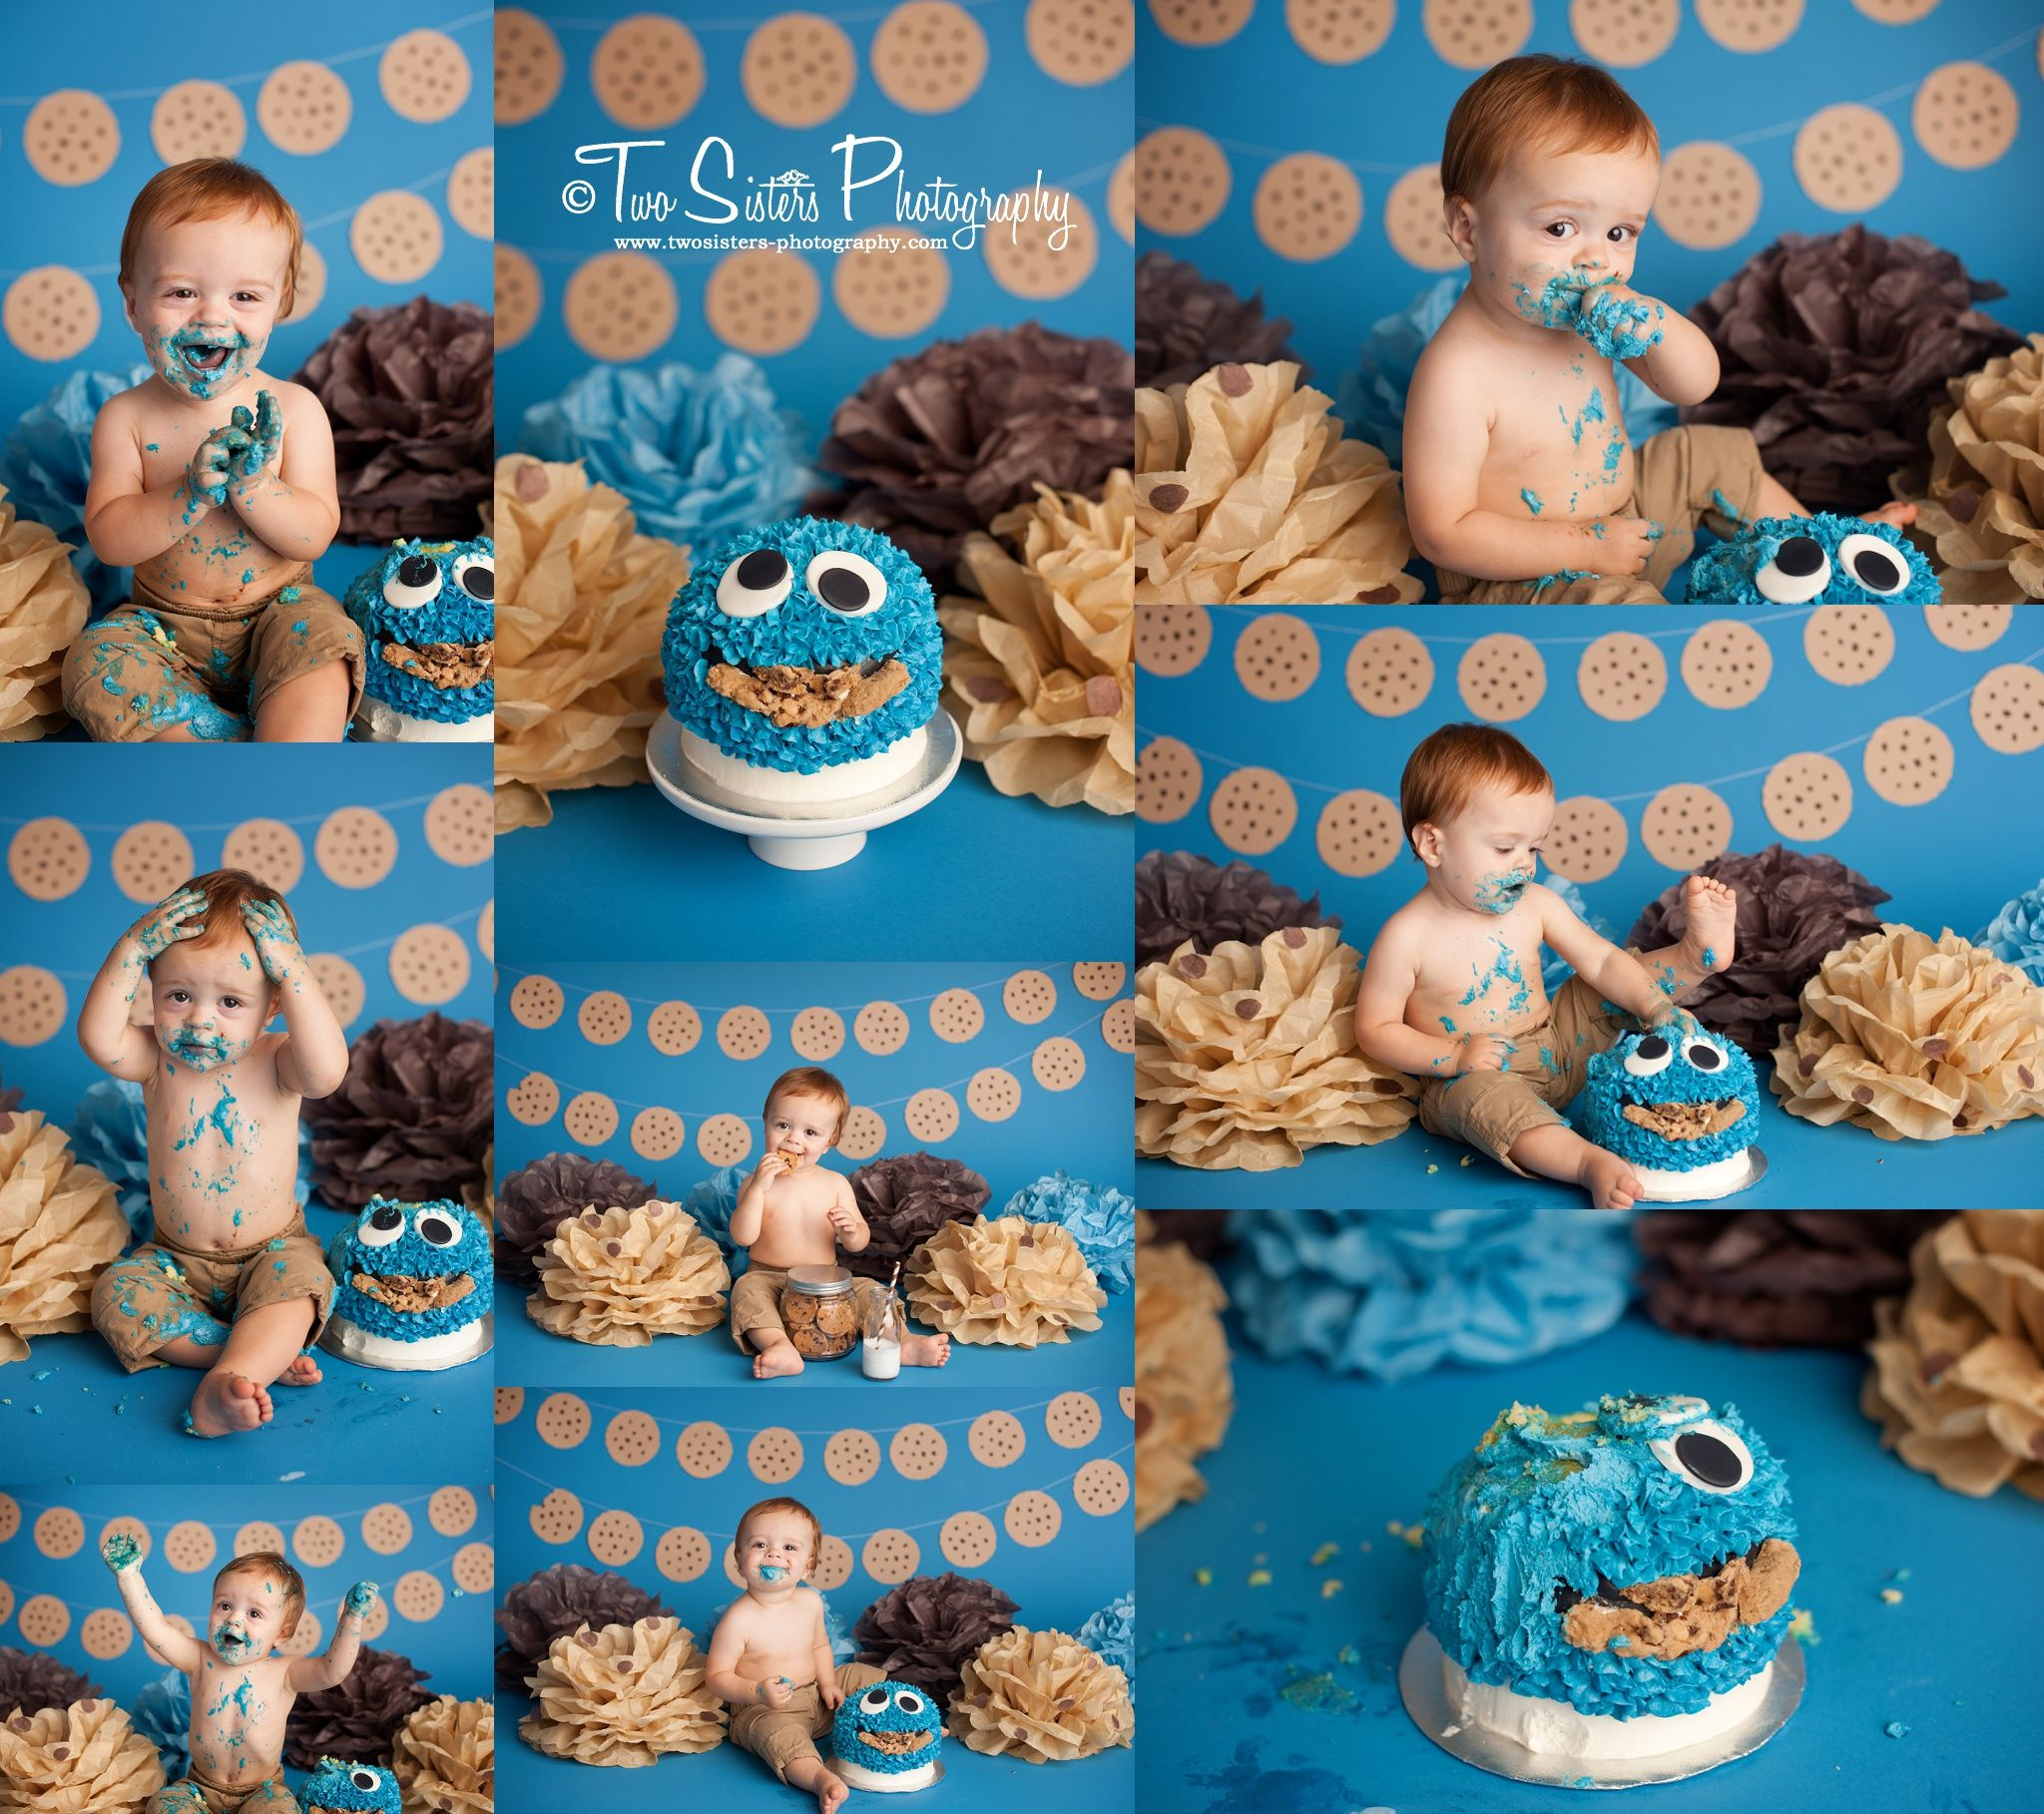 Cookie monster cake smash session first birthday cake smash